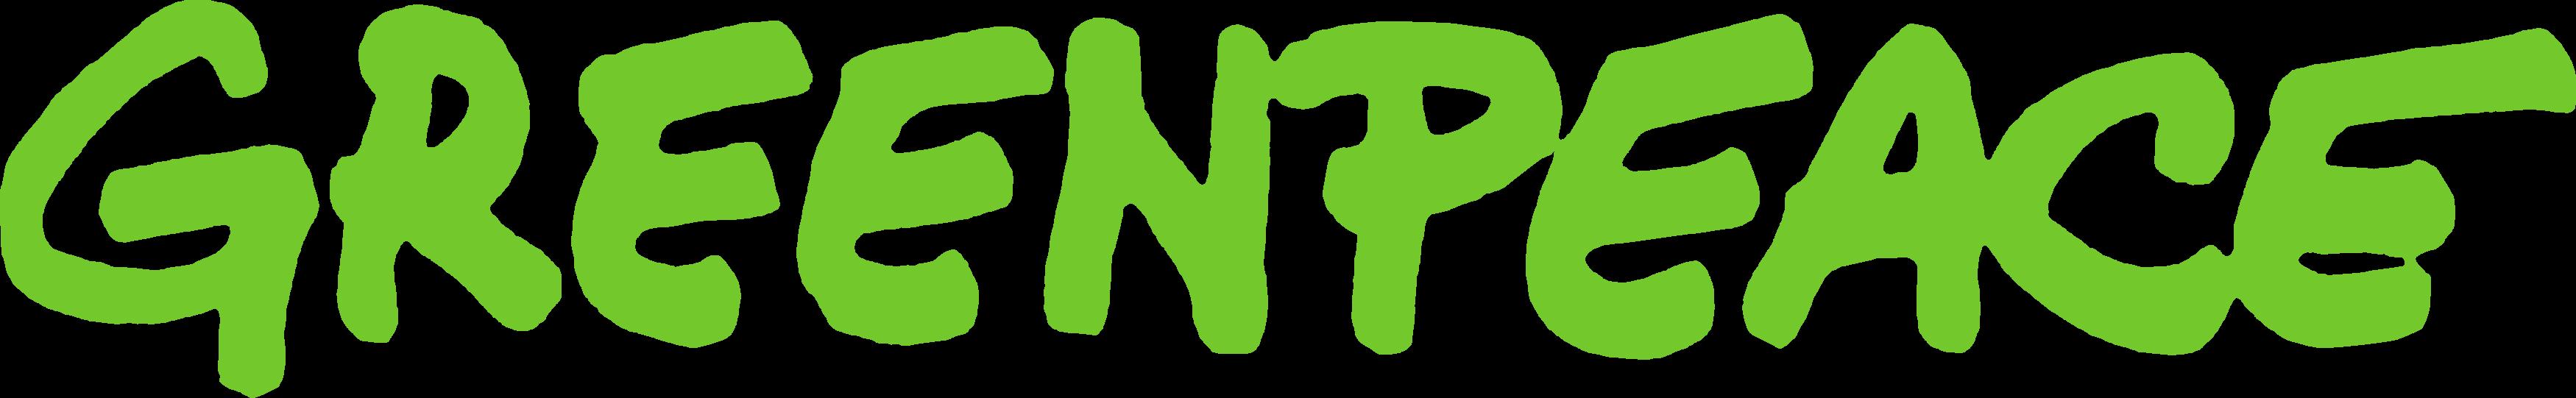 greenpeace logo - Greenpeace Logo